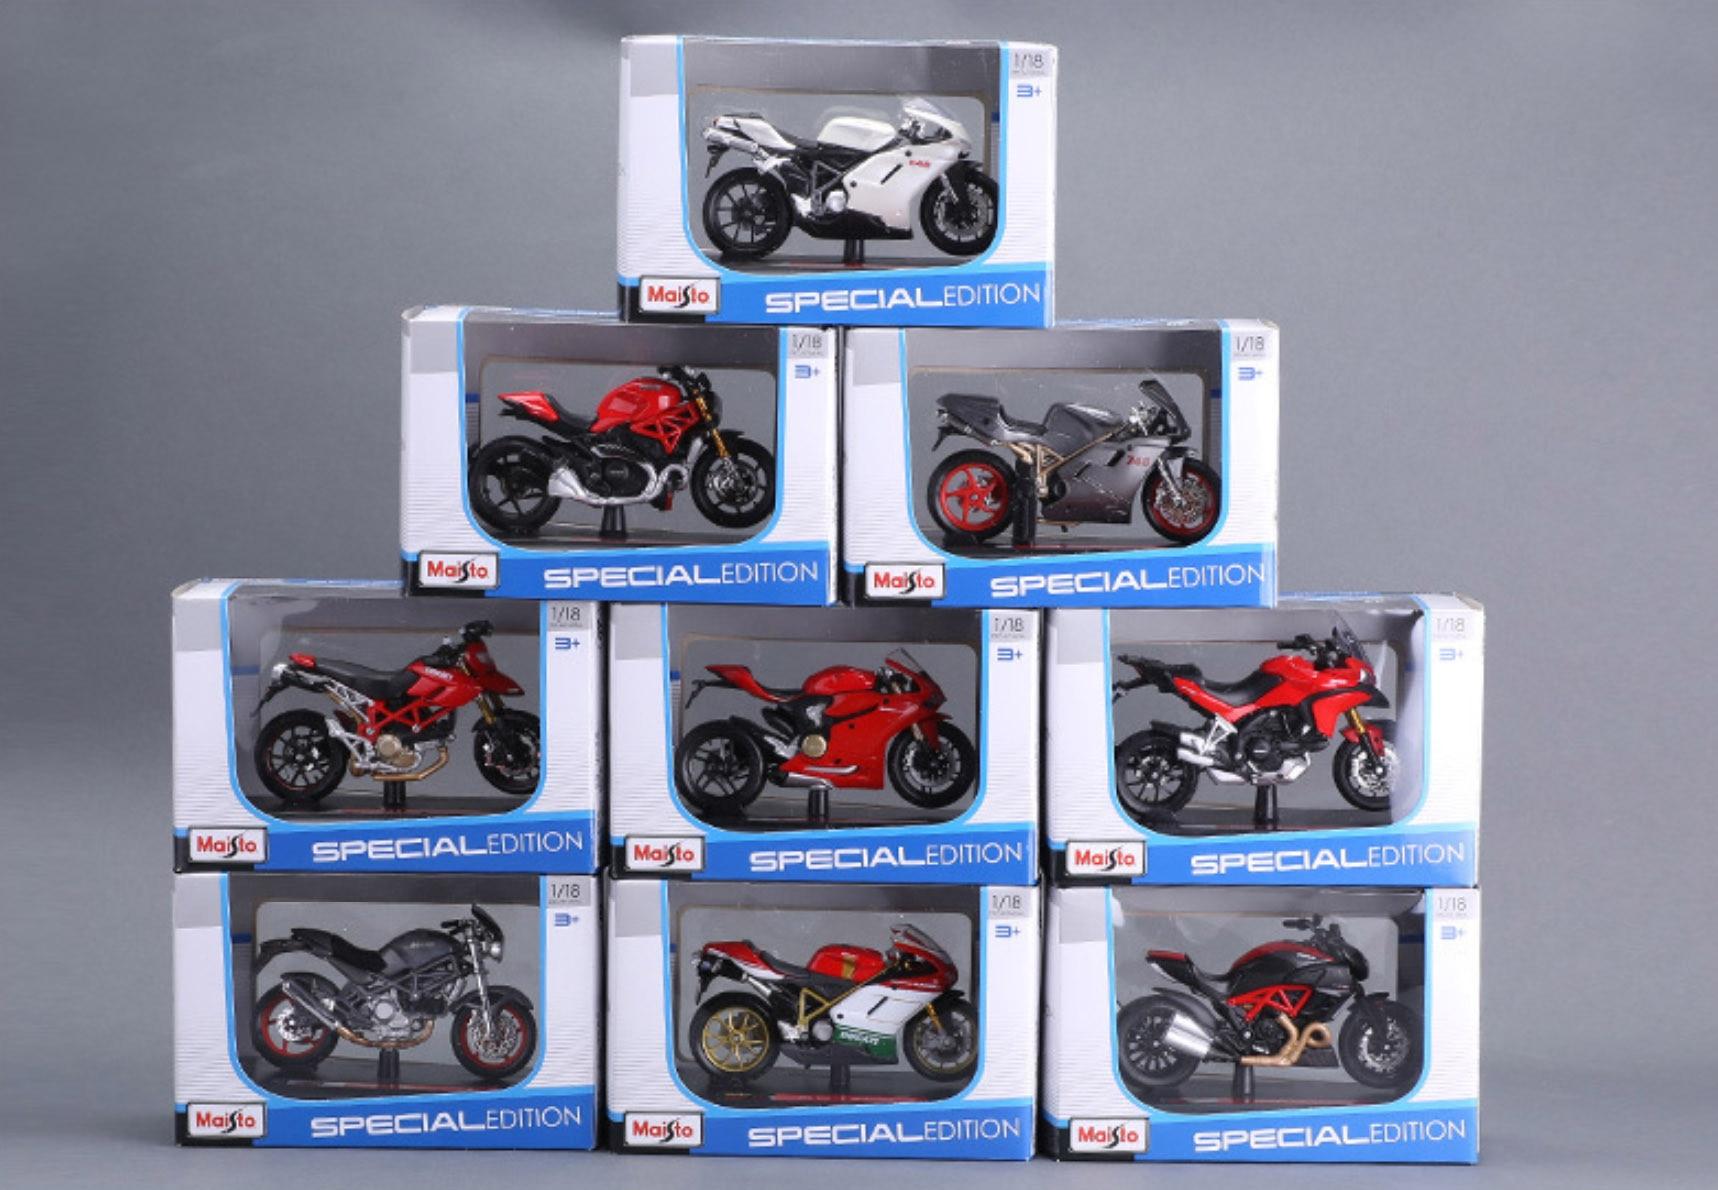 Maisto 1/18 1:18 Scale Suzuki Kawasaki Yamaha Triumph KTM Ducati Motorcycles Motorbikes Diecast Display Models Toy For Boys Kids